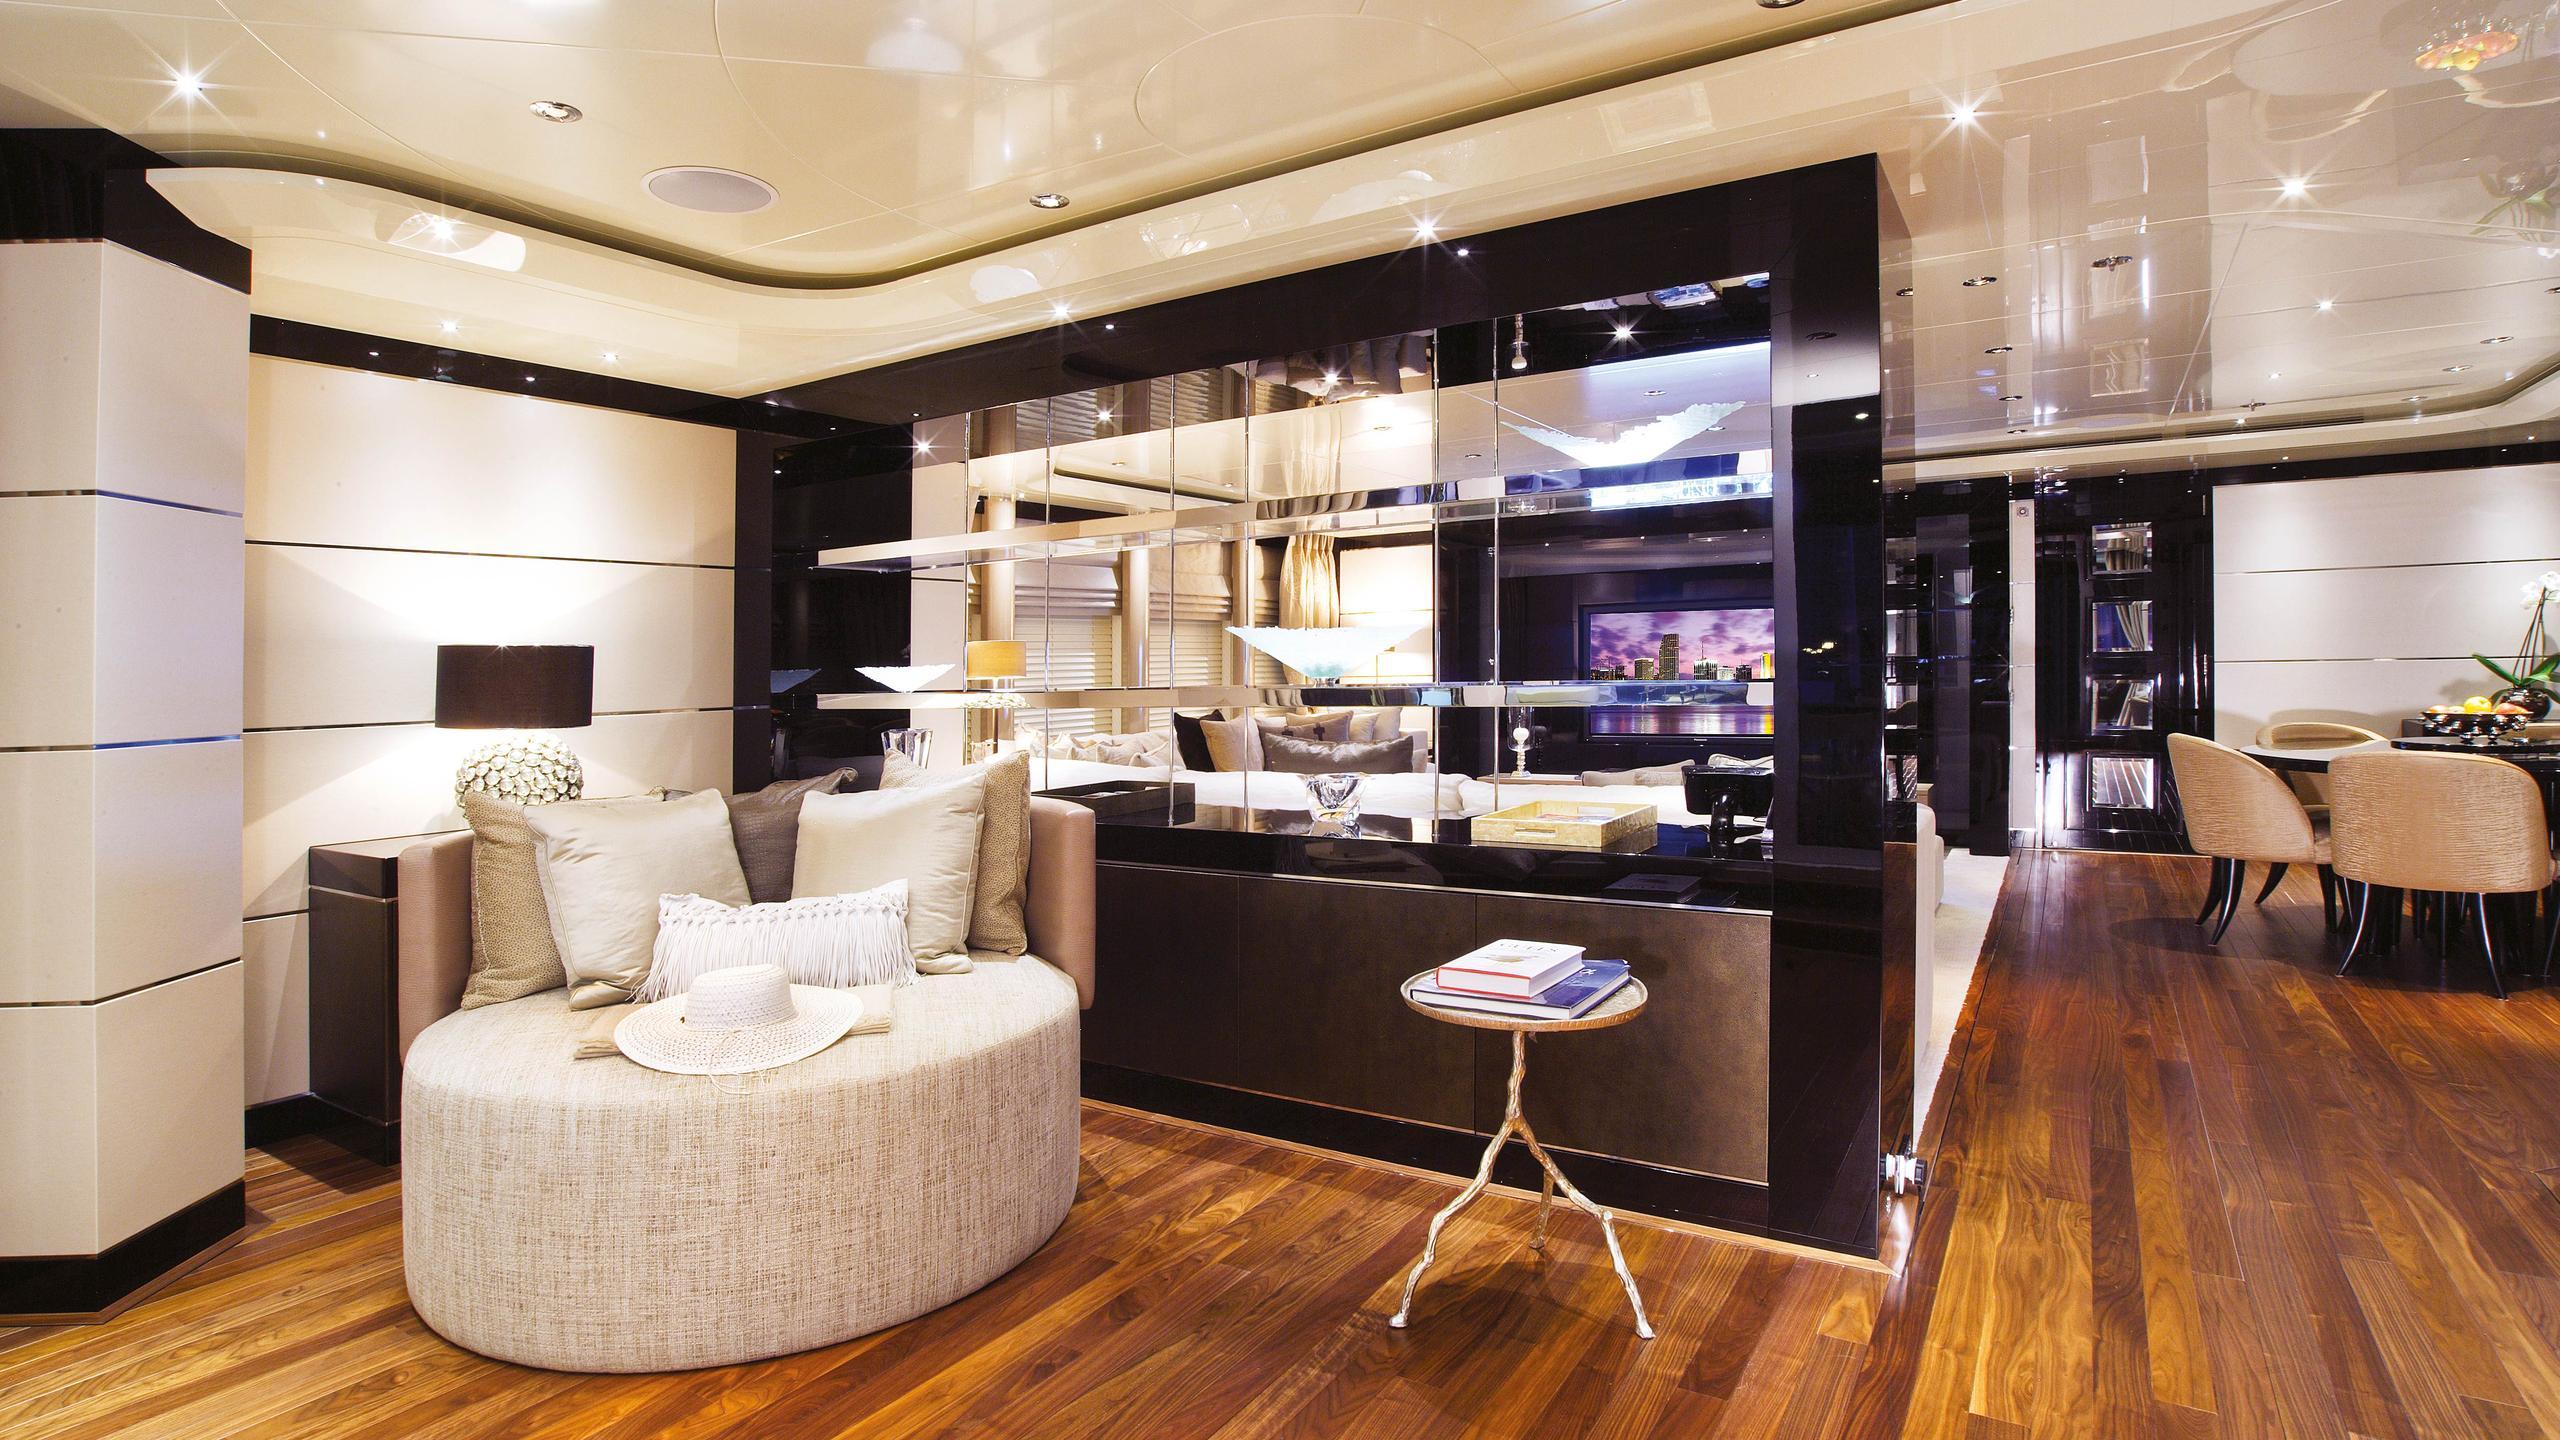 talisman-c-motor-yacht-Turquoise-2011-71m-sky-lounge